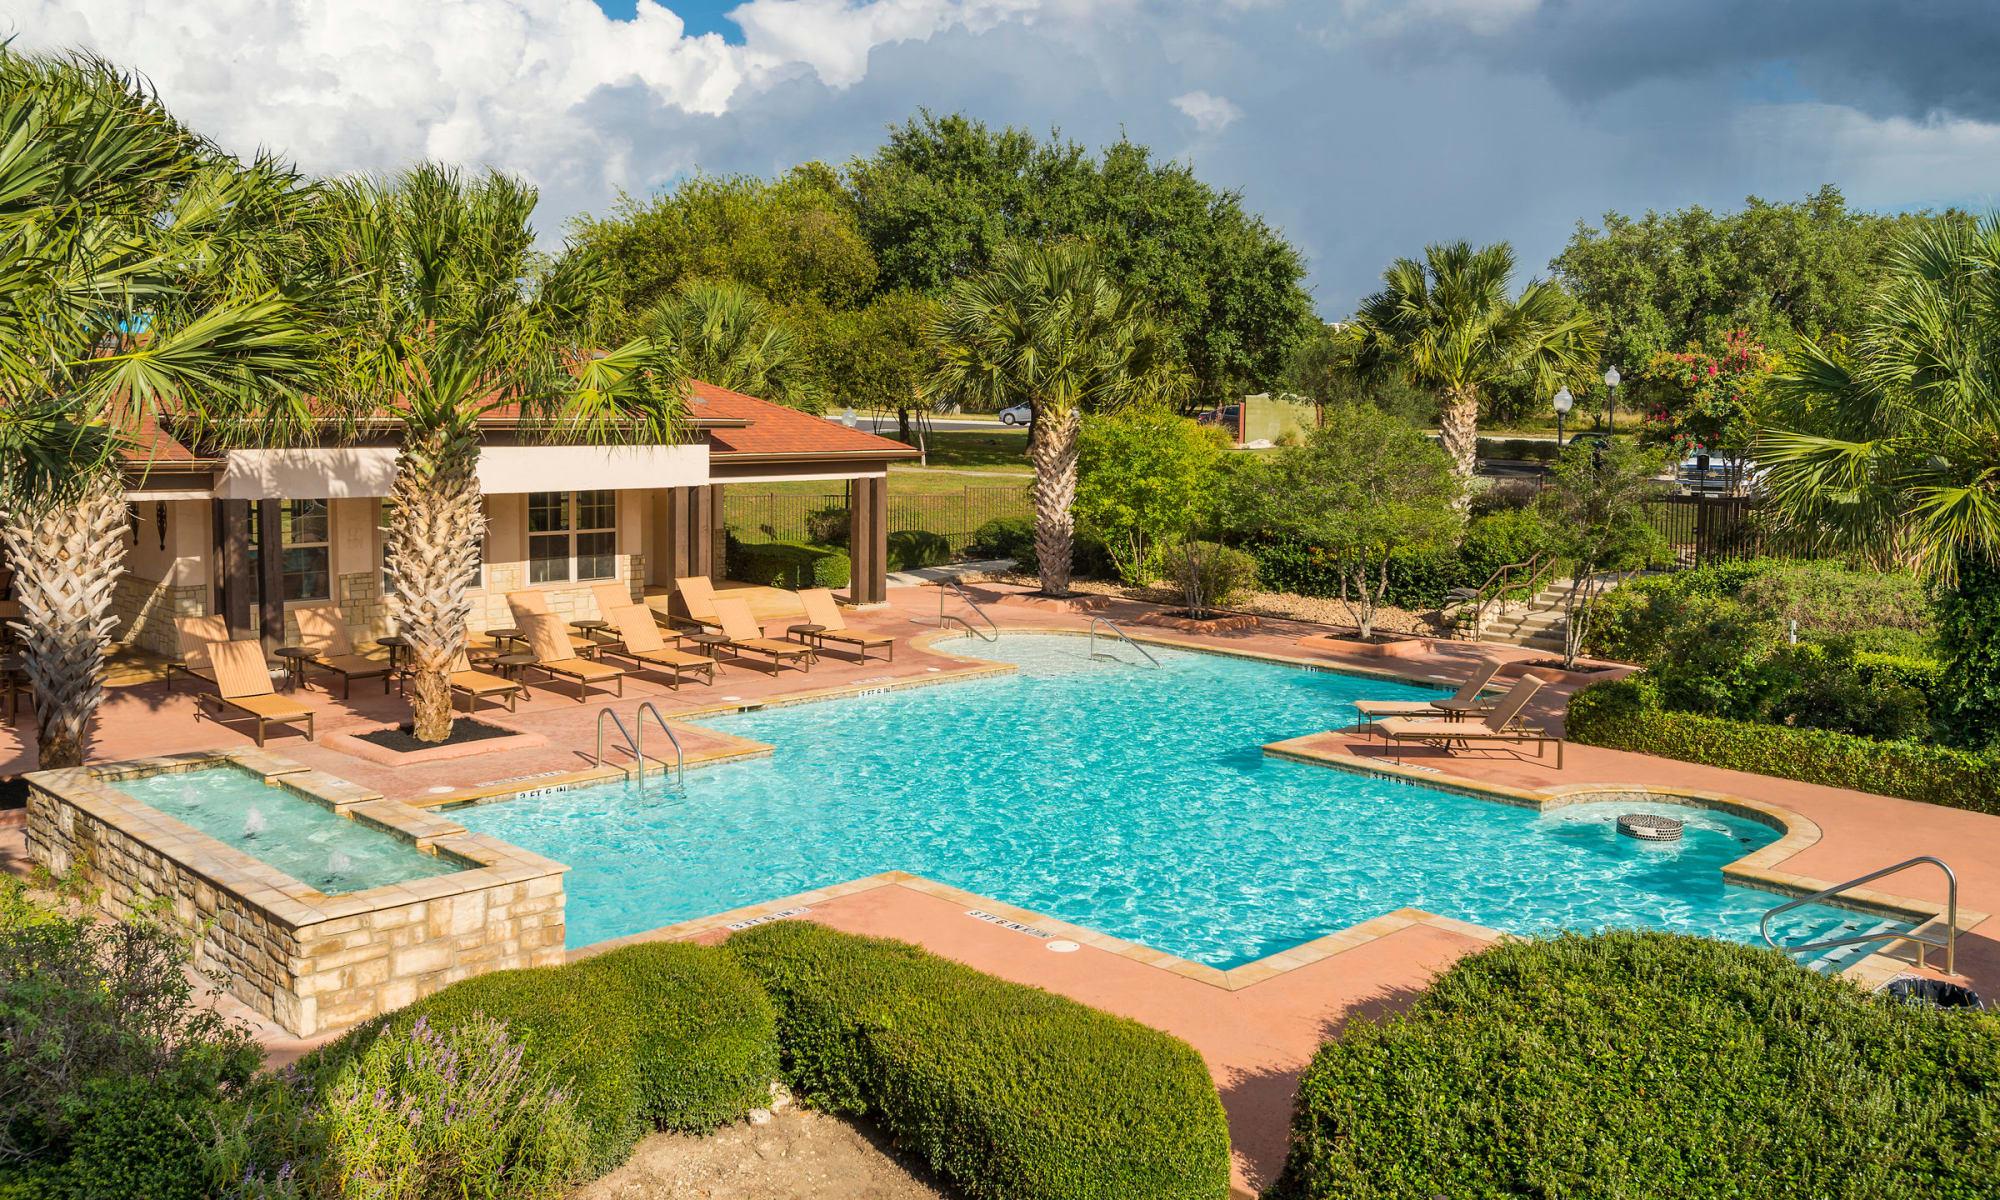 Apartments at Villas at Medical Center in San Antonio, Texas